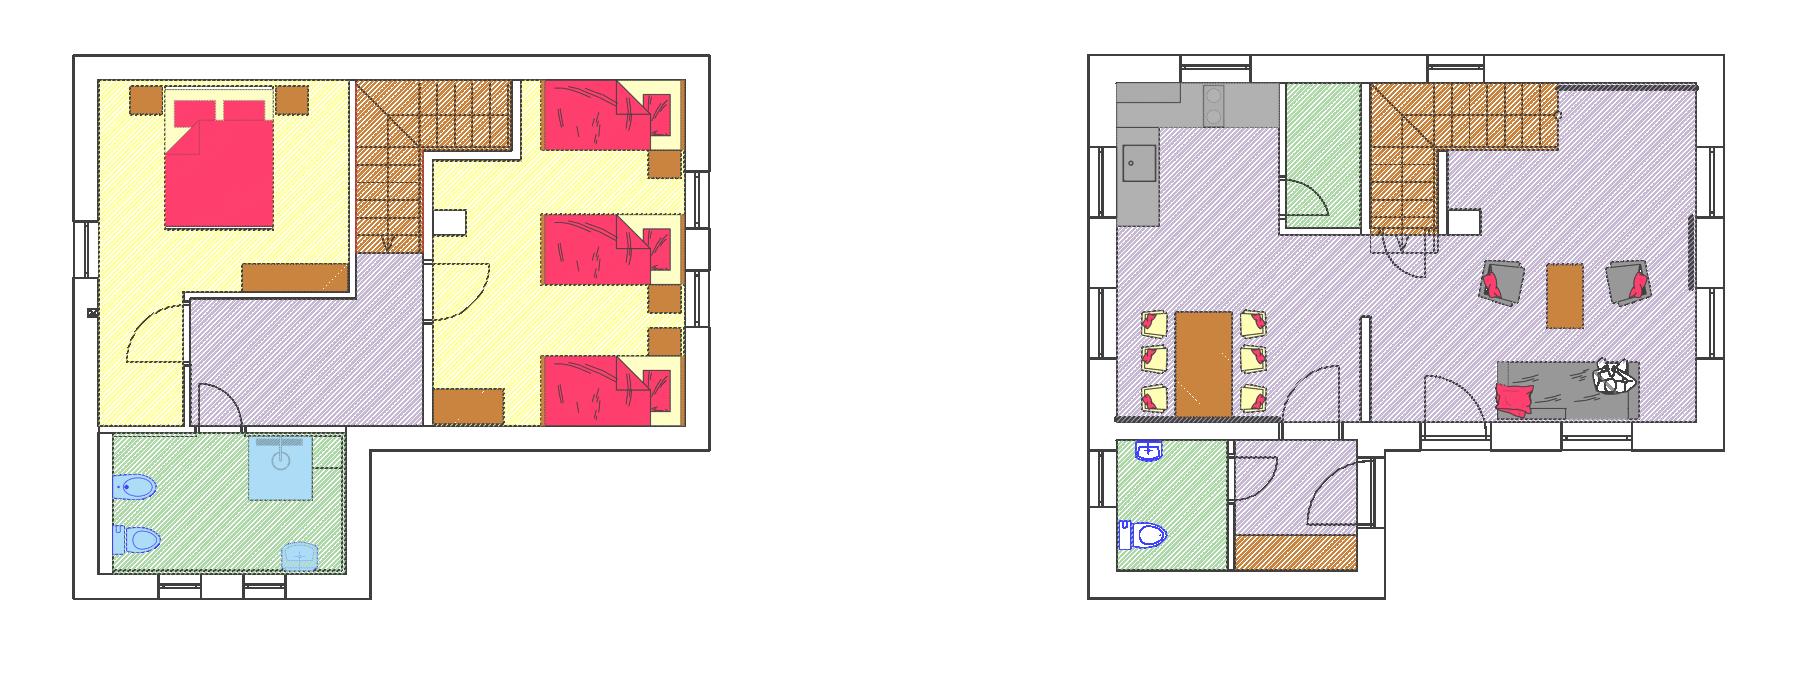 Gothal - ubytovanie Donovaly - pôdorys chalupy typu D